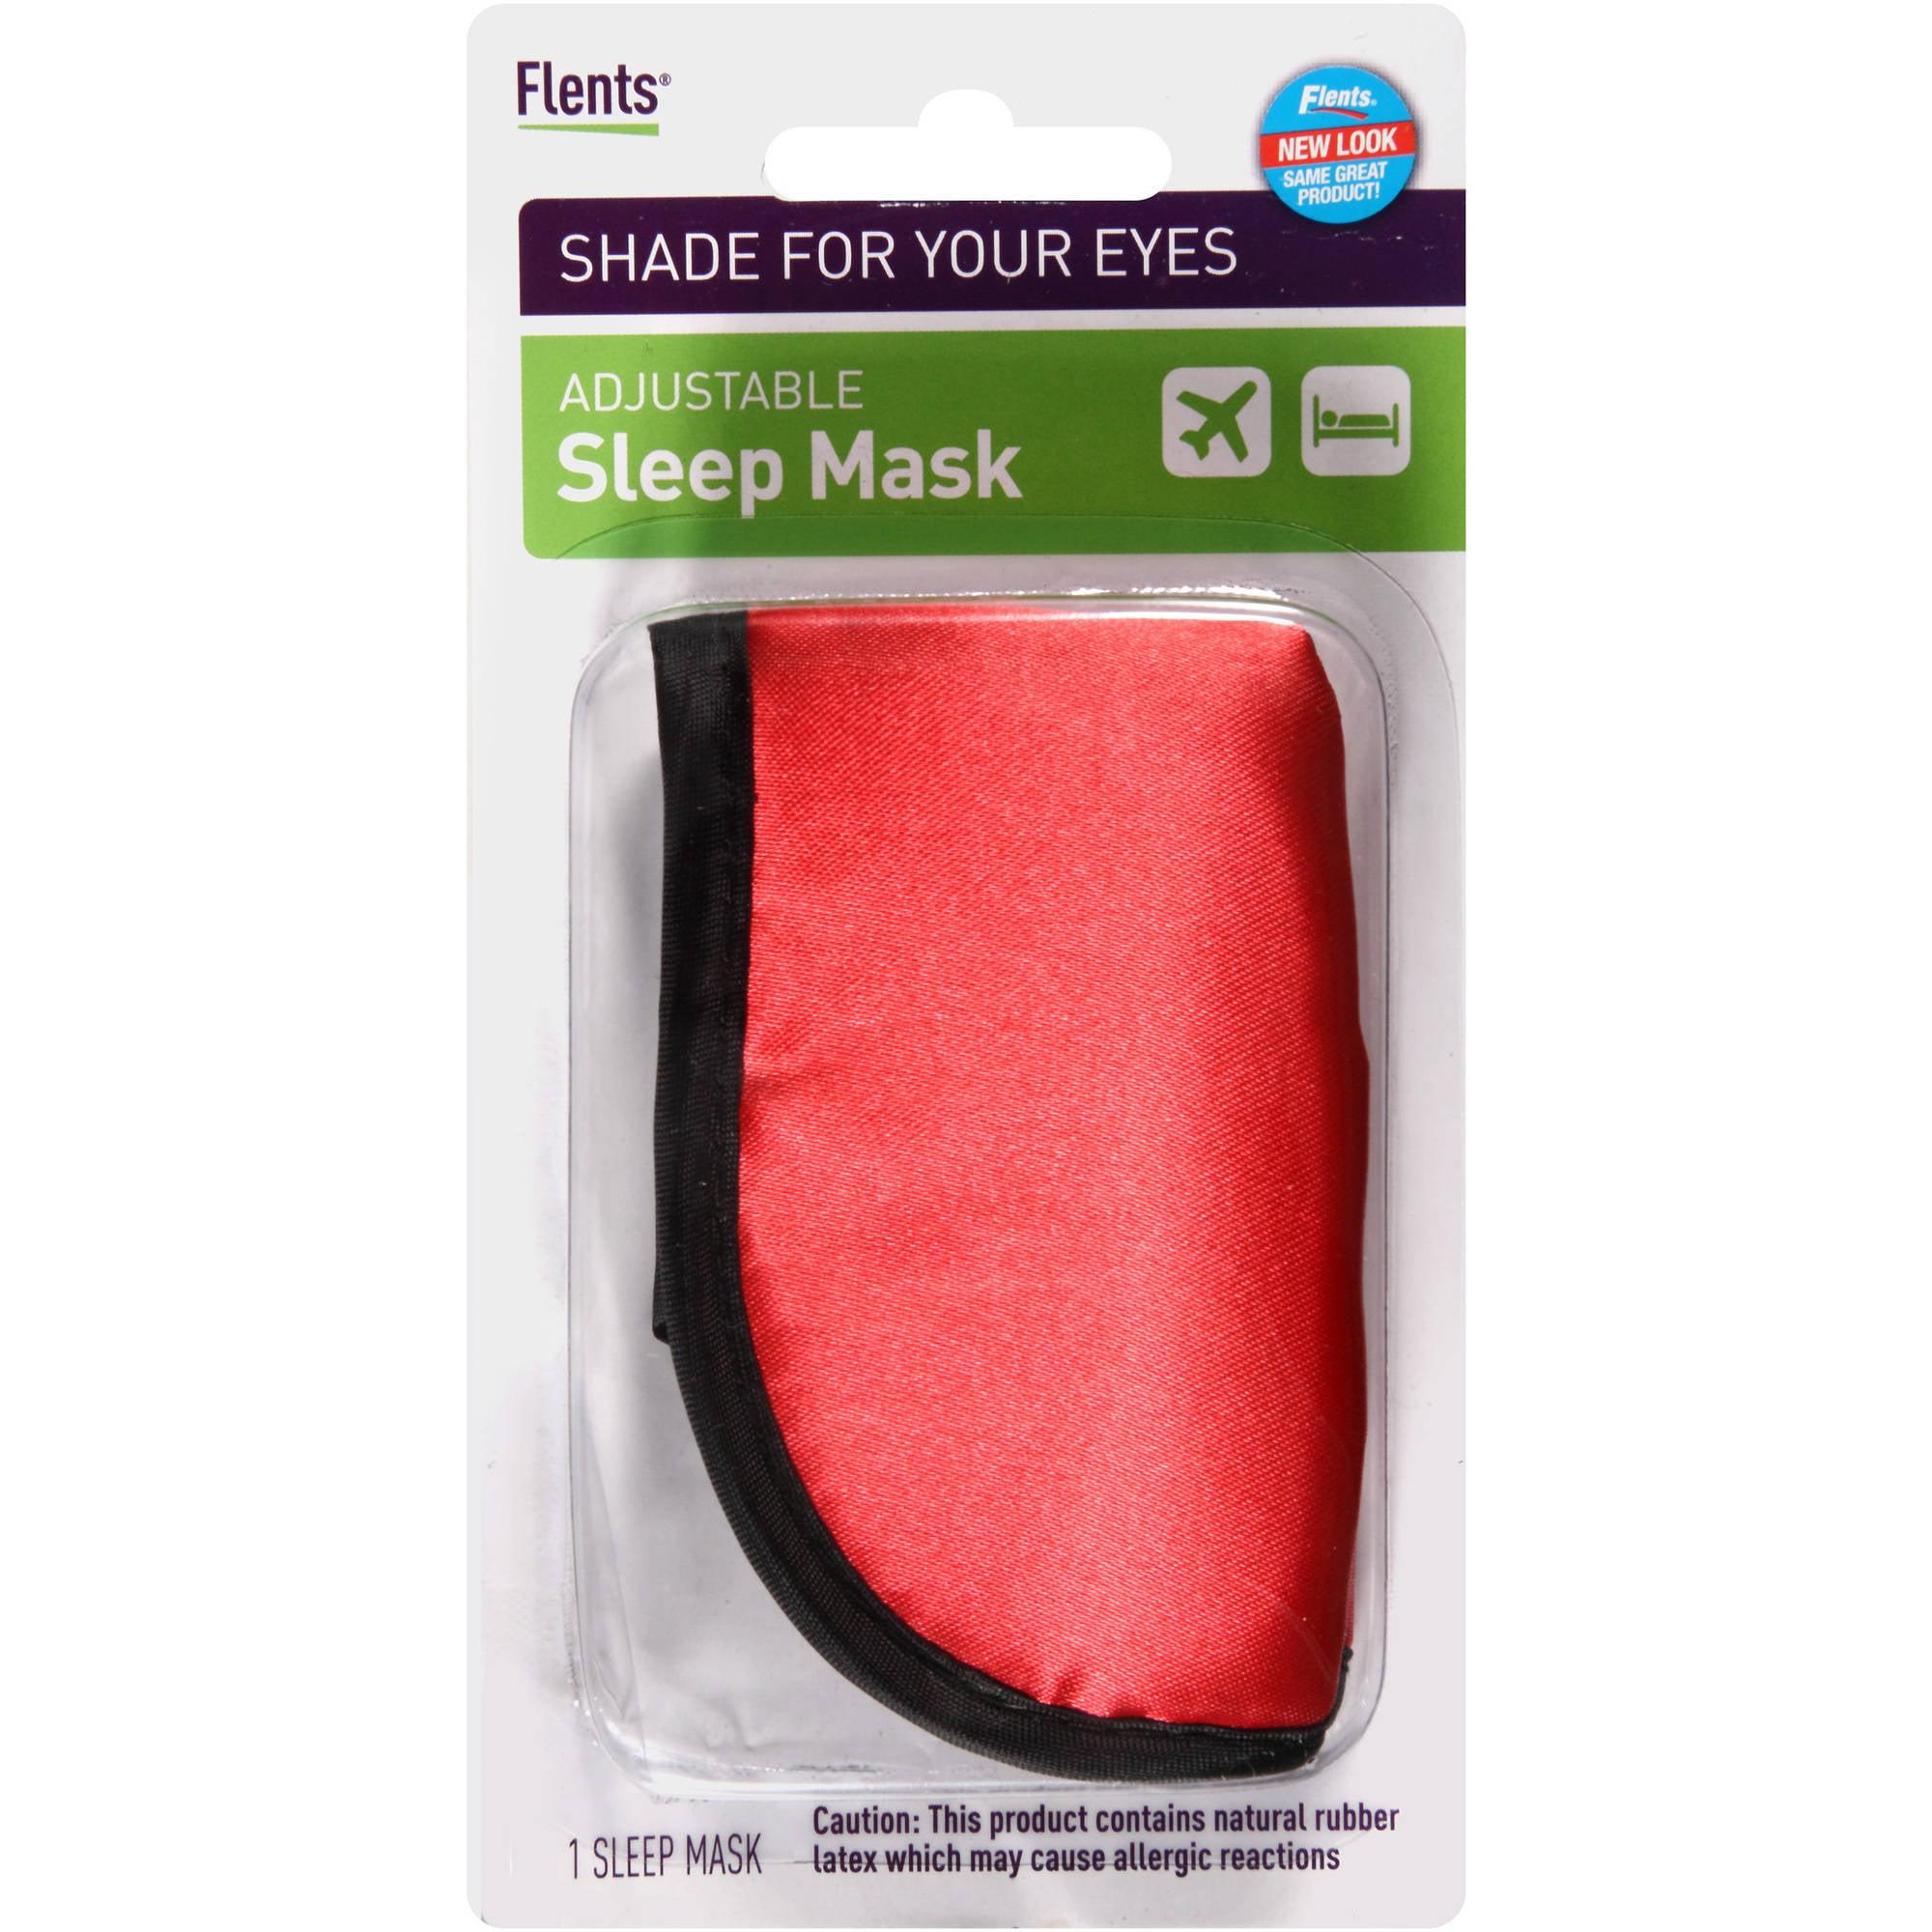 Flents Siesta Mask Reusable Sleep Mask